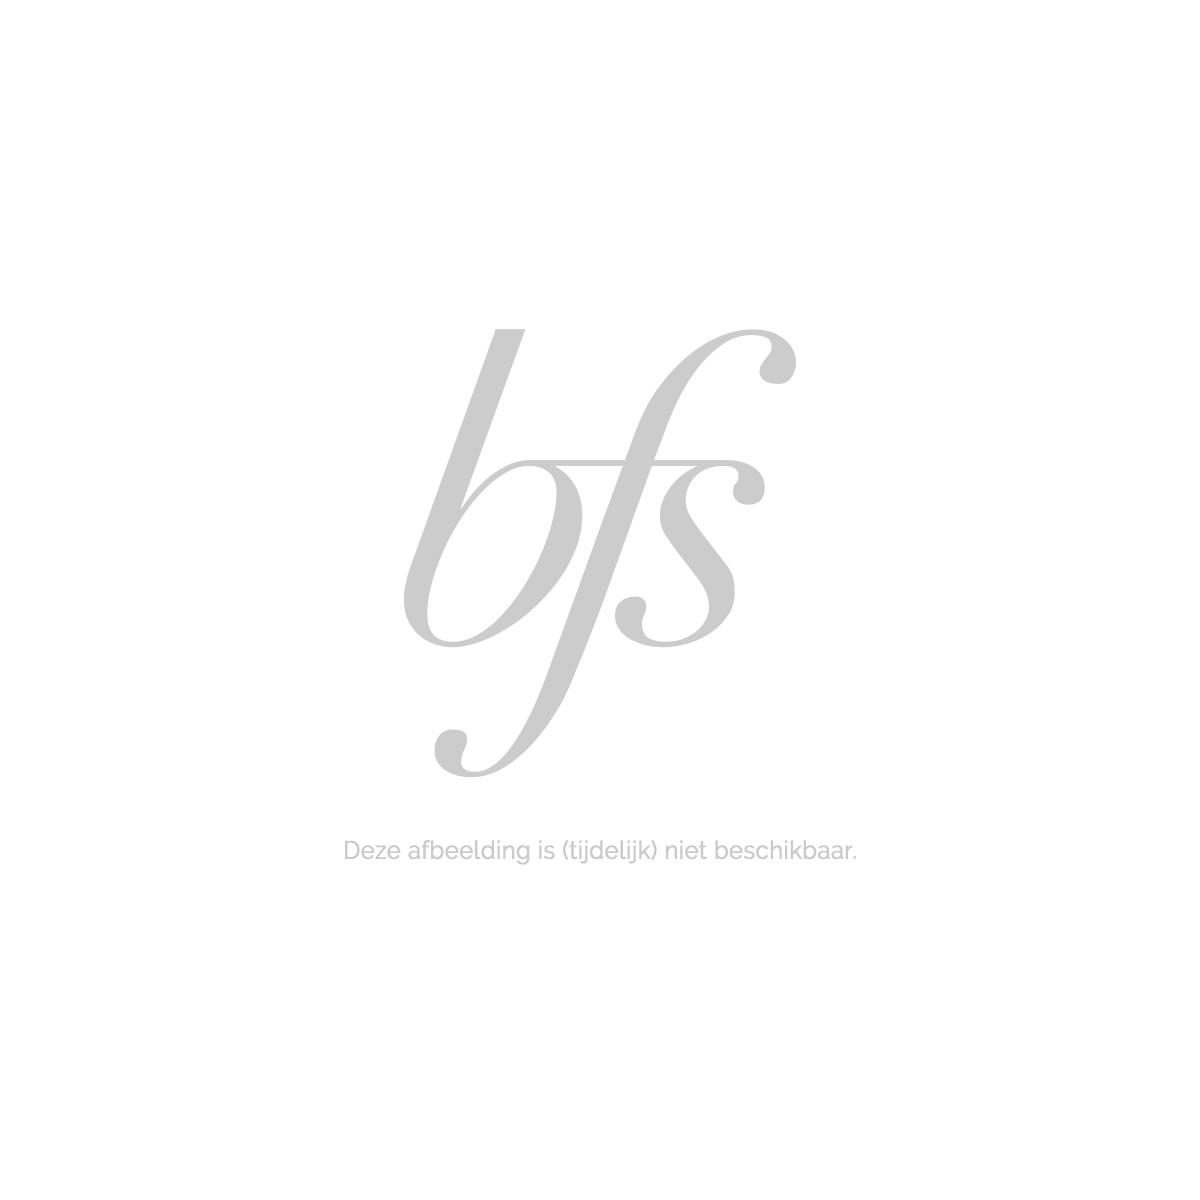 Declaré Bb Cream Hydro Force Spf 30